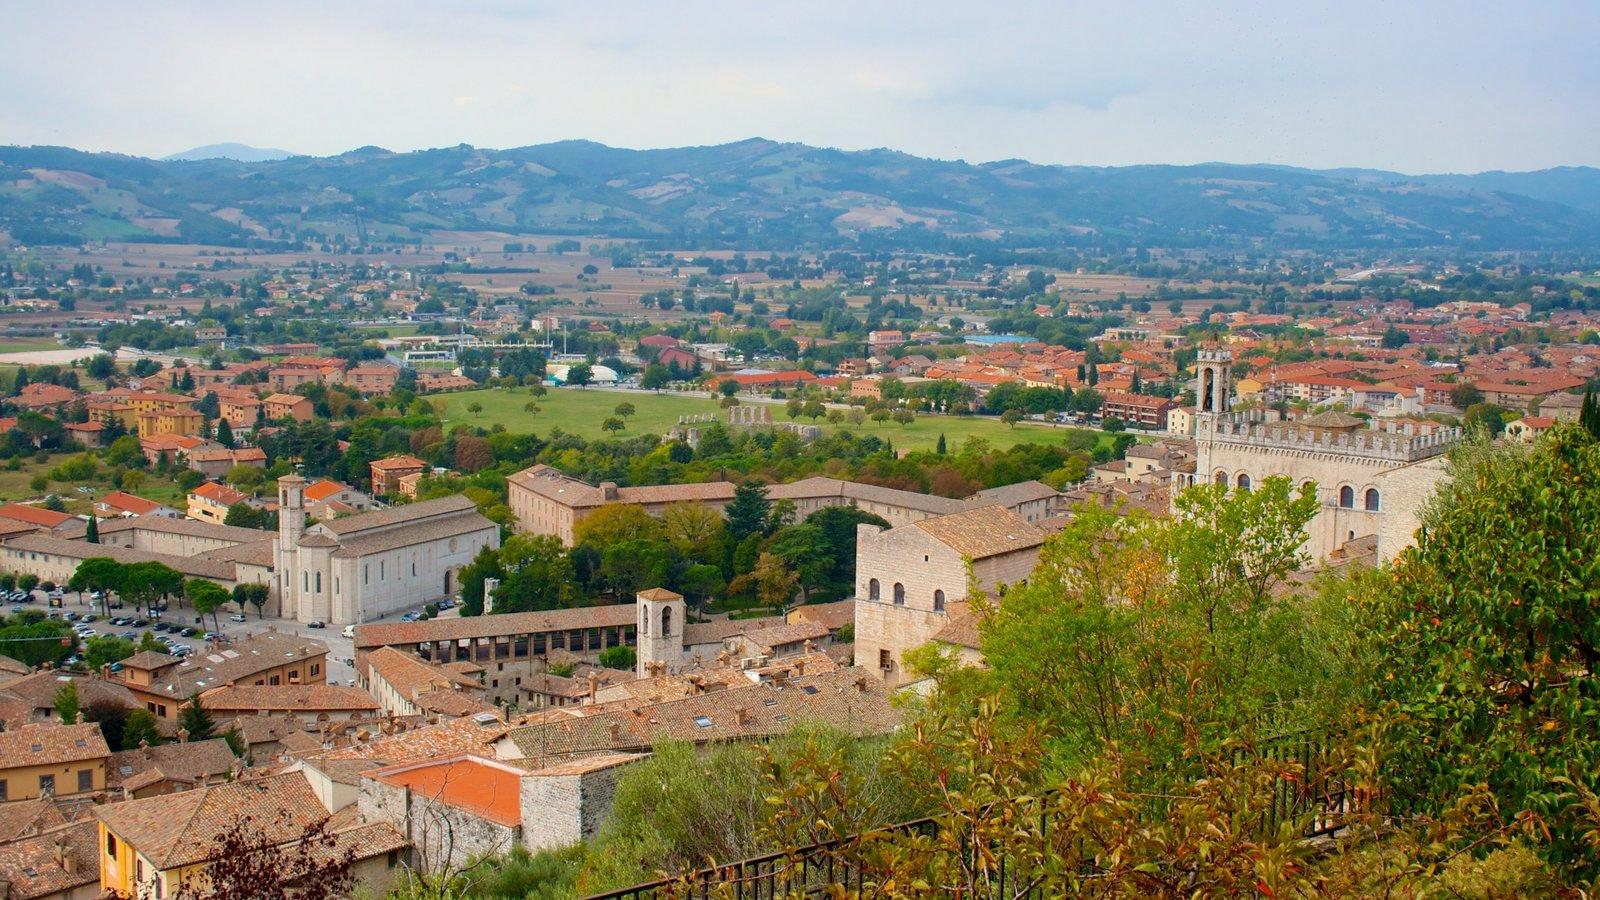 Gubbio which includes a city